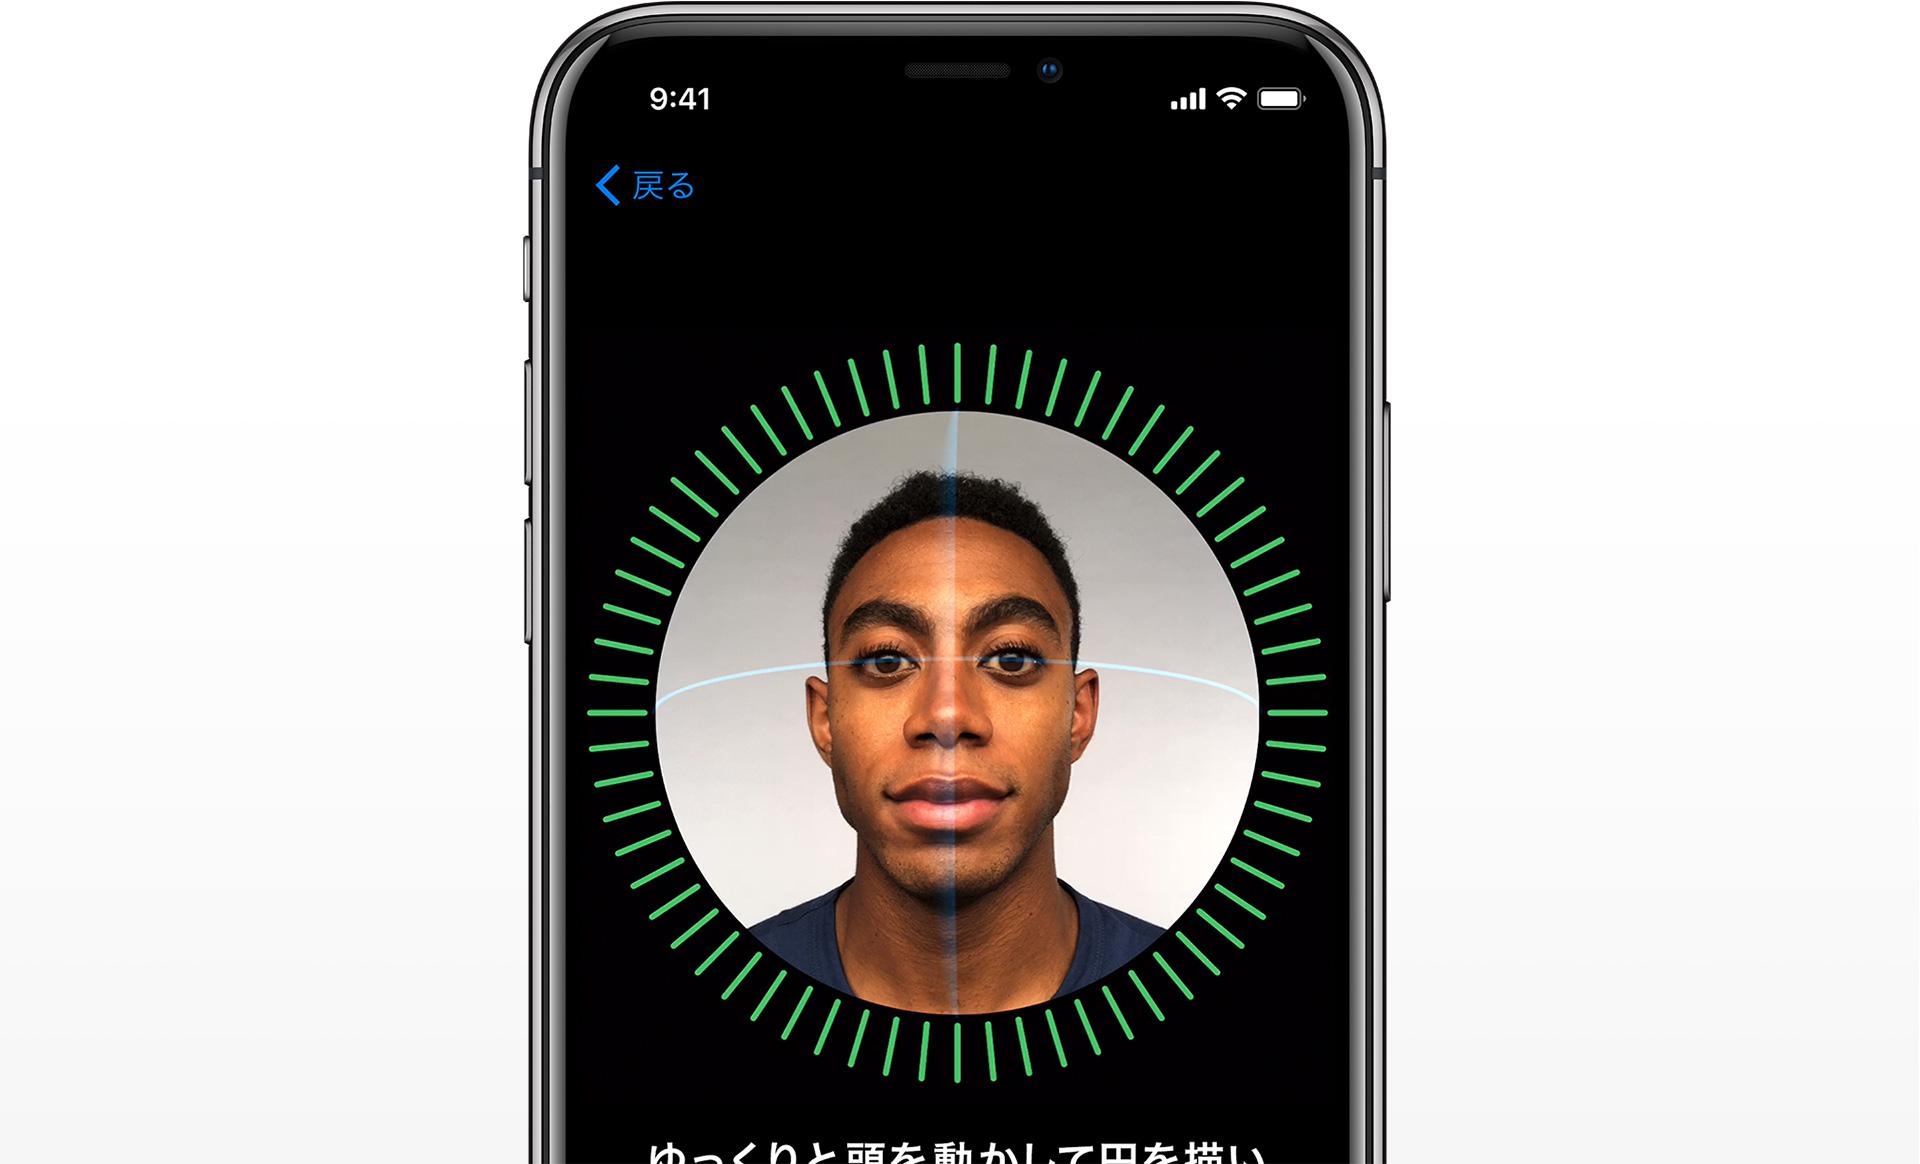 TrueDepthカメラによる機能を使い、目に見えない30,000以上のドットで顔の立体構造を把握する技術